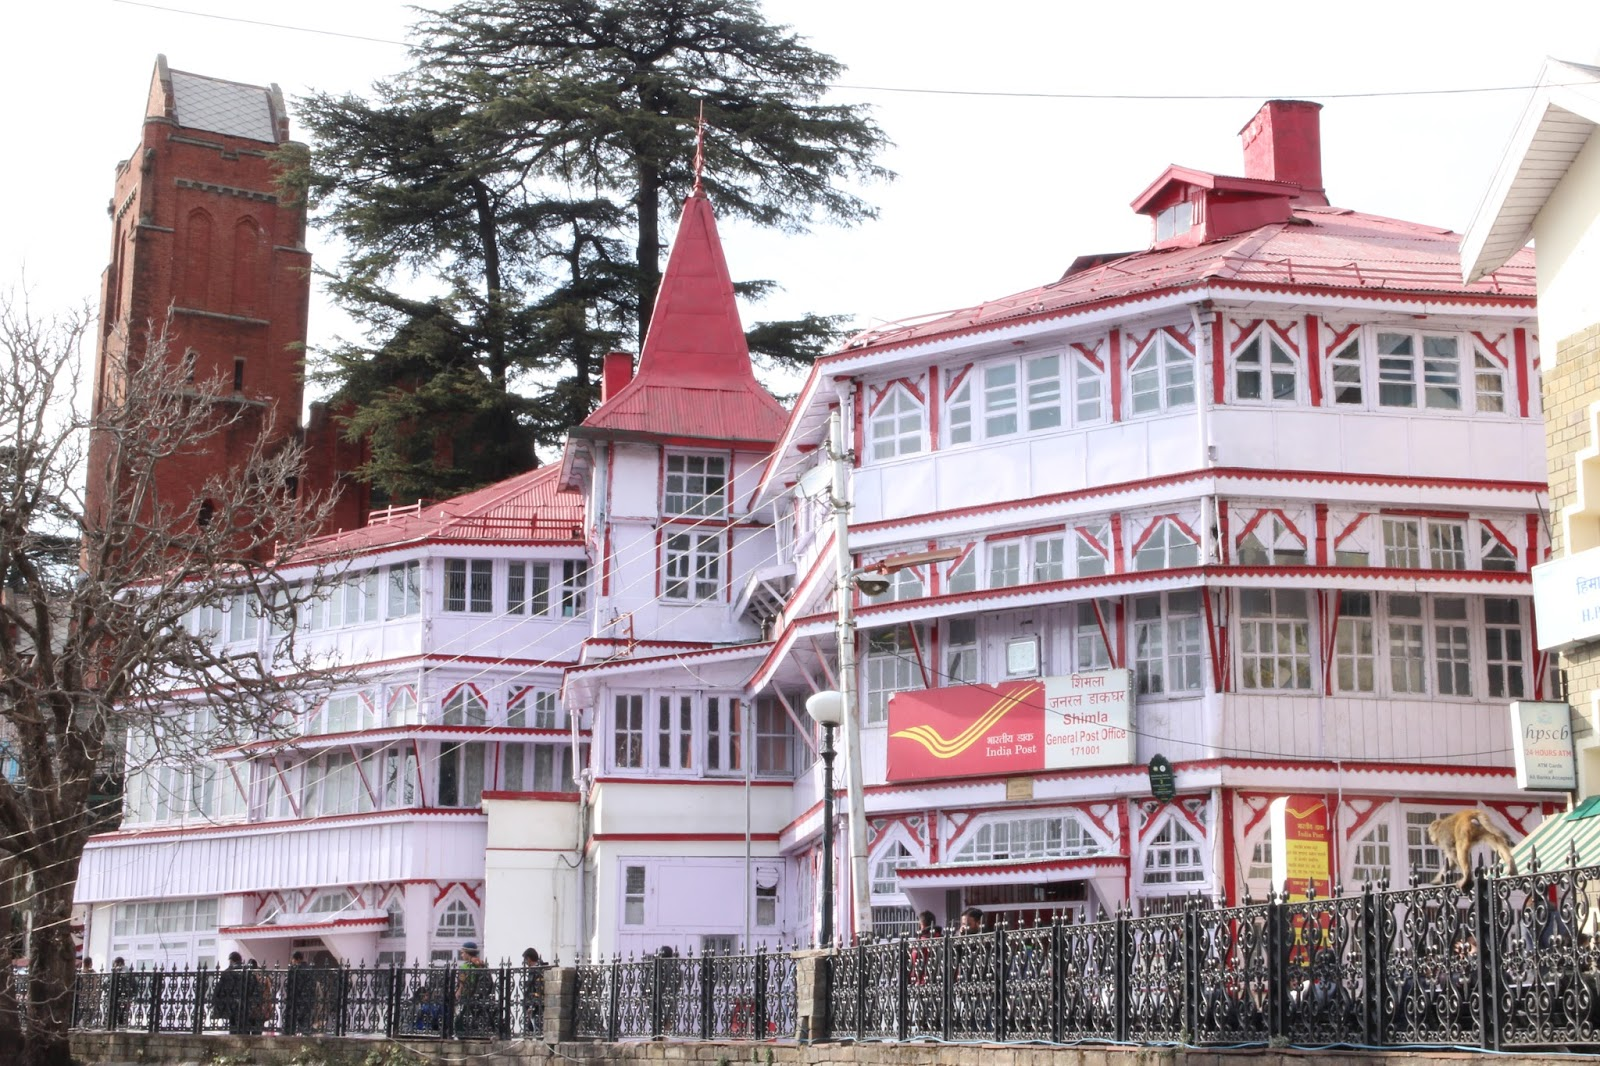 My World A Photo Tour Of Mall Road Shimla